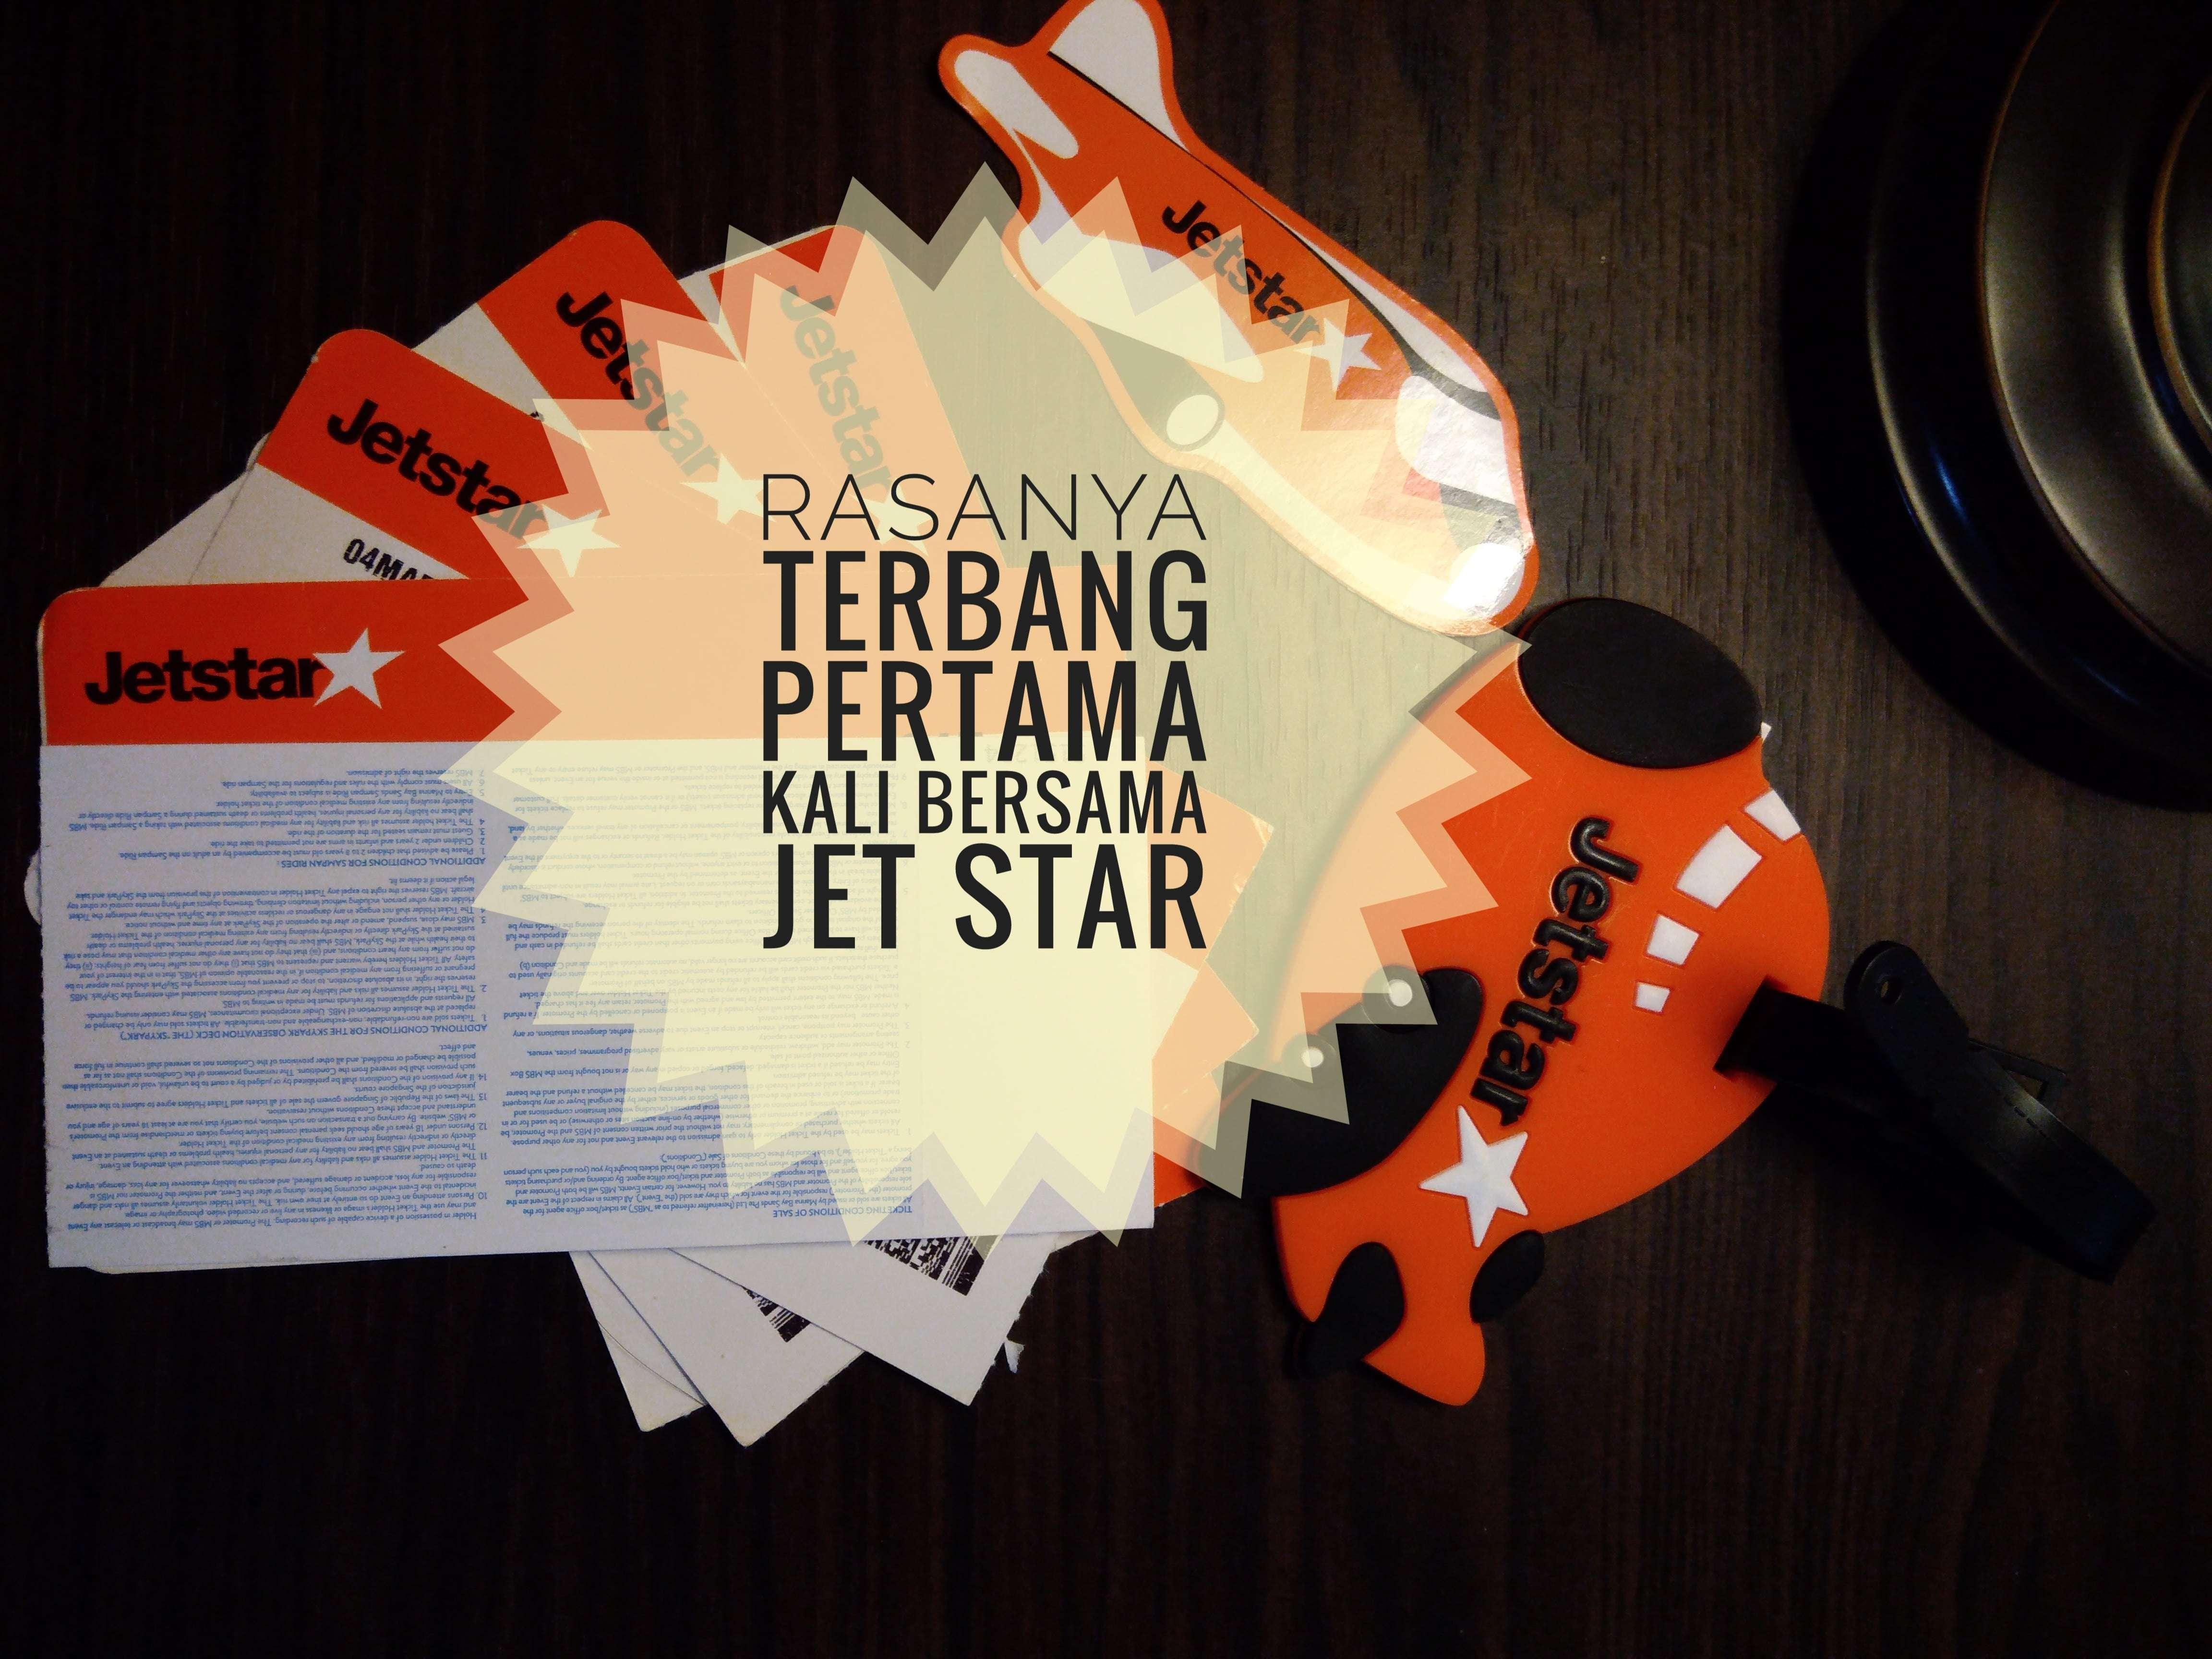 Rasanya Pertama Kali Terbang Bersama Jetstar